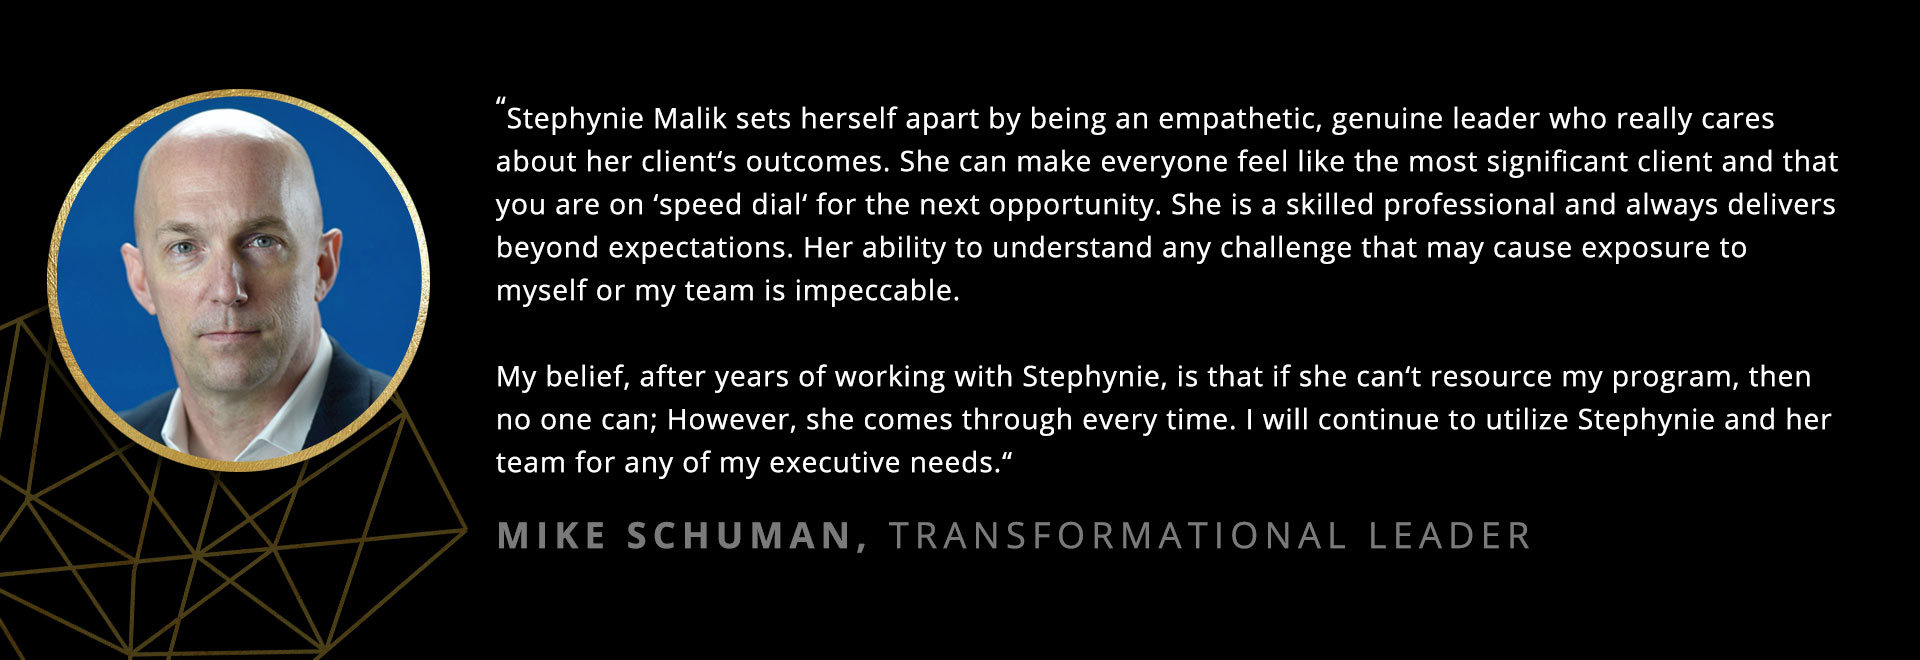 Testimonial_Schuman.jpg